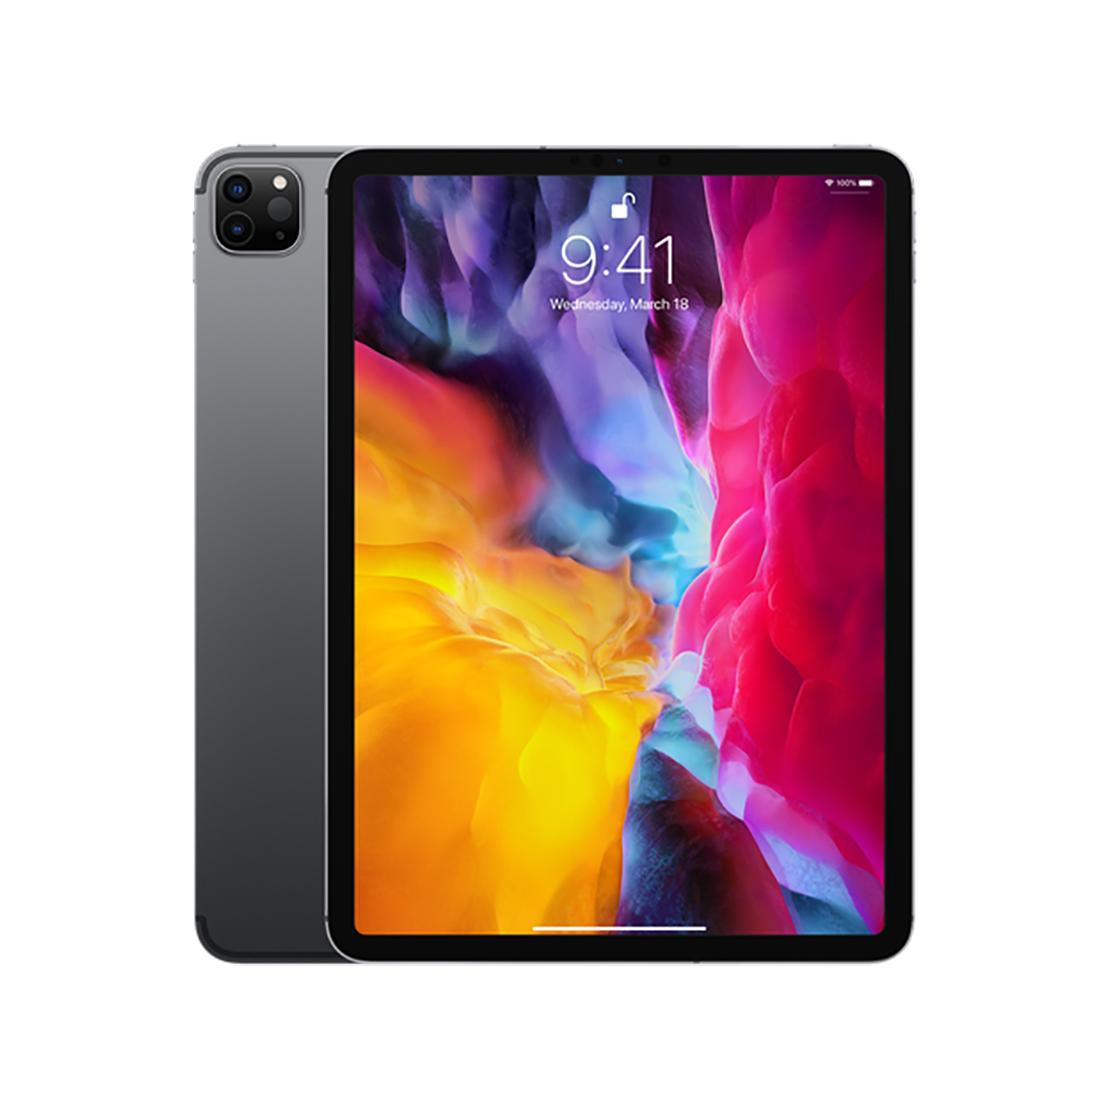 iPad Pro 11-inch (2020) Wifi 512GB - TecHland - Số 1 Điện Thoại iPhone, Máy  Tính Apple, Loa Bluetooth Cao Cấp.